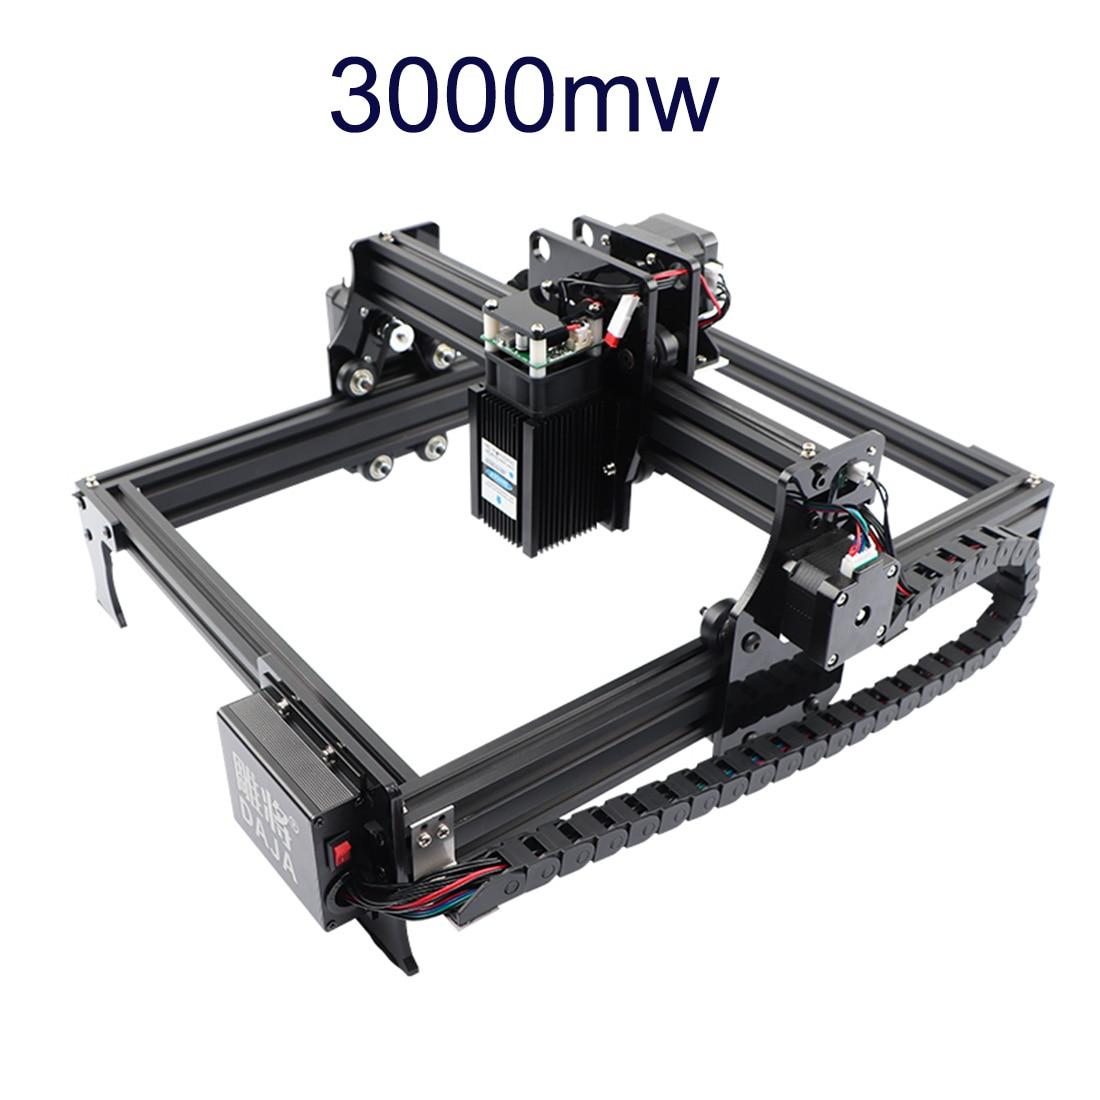 A3 3000mw 4500mw 7000mw DIY Laser Engraving Machine Mini Engraver Cutting Machine With WIFI Xmas Gift- US Plug/EU Plug/UK Plug